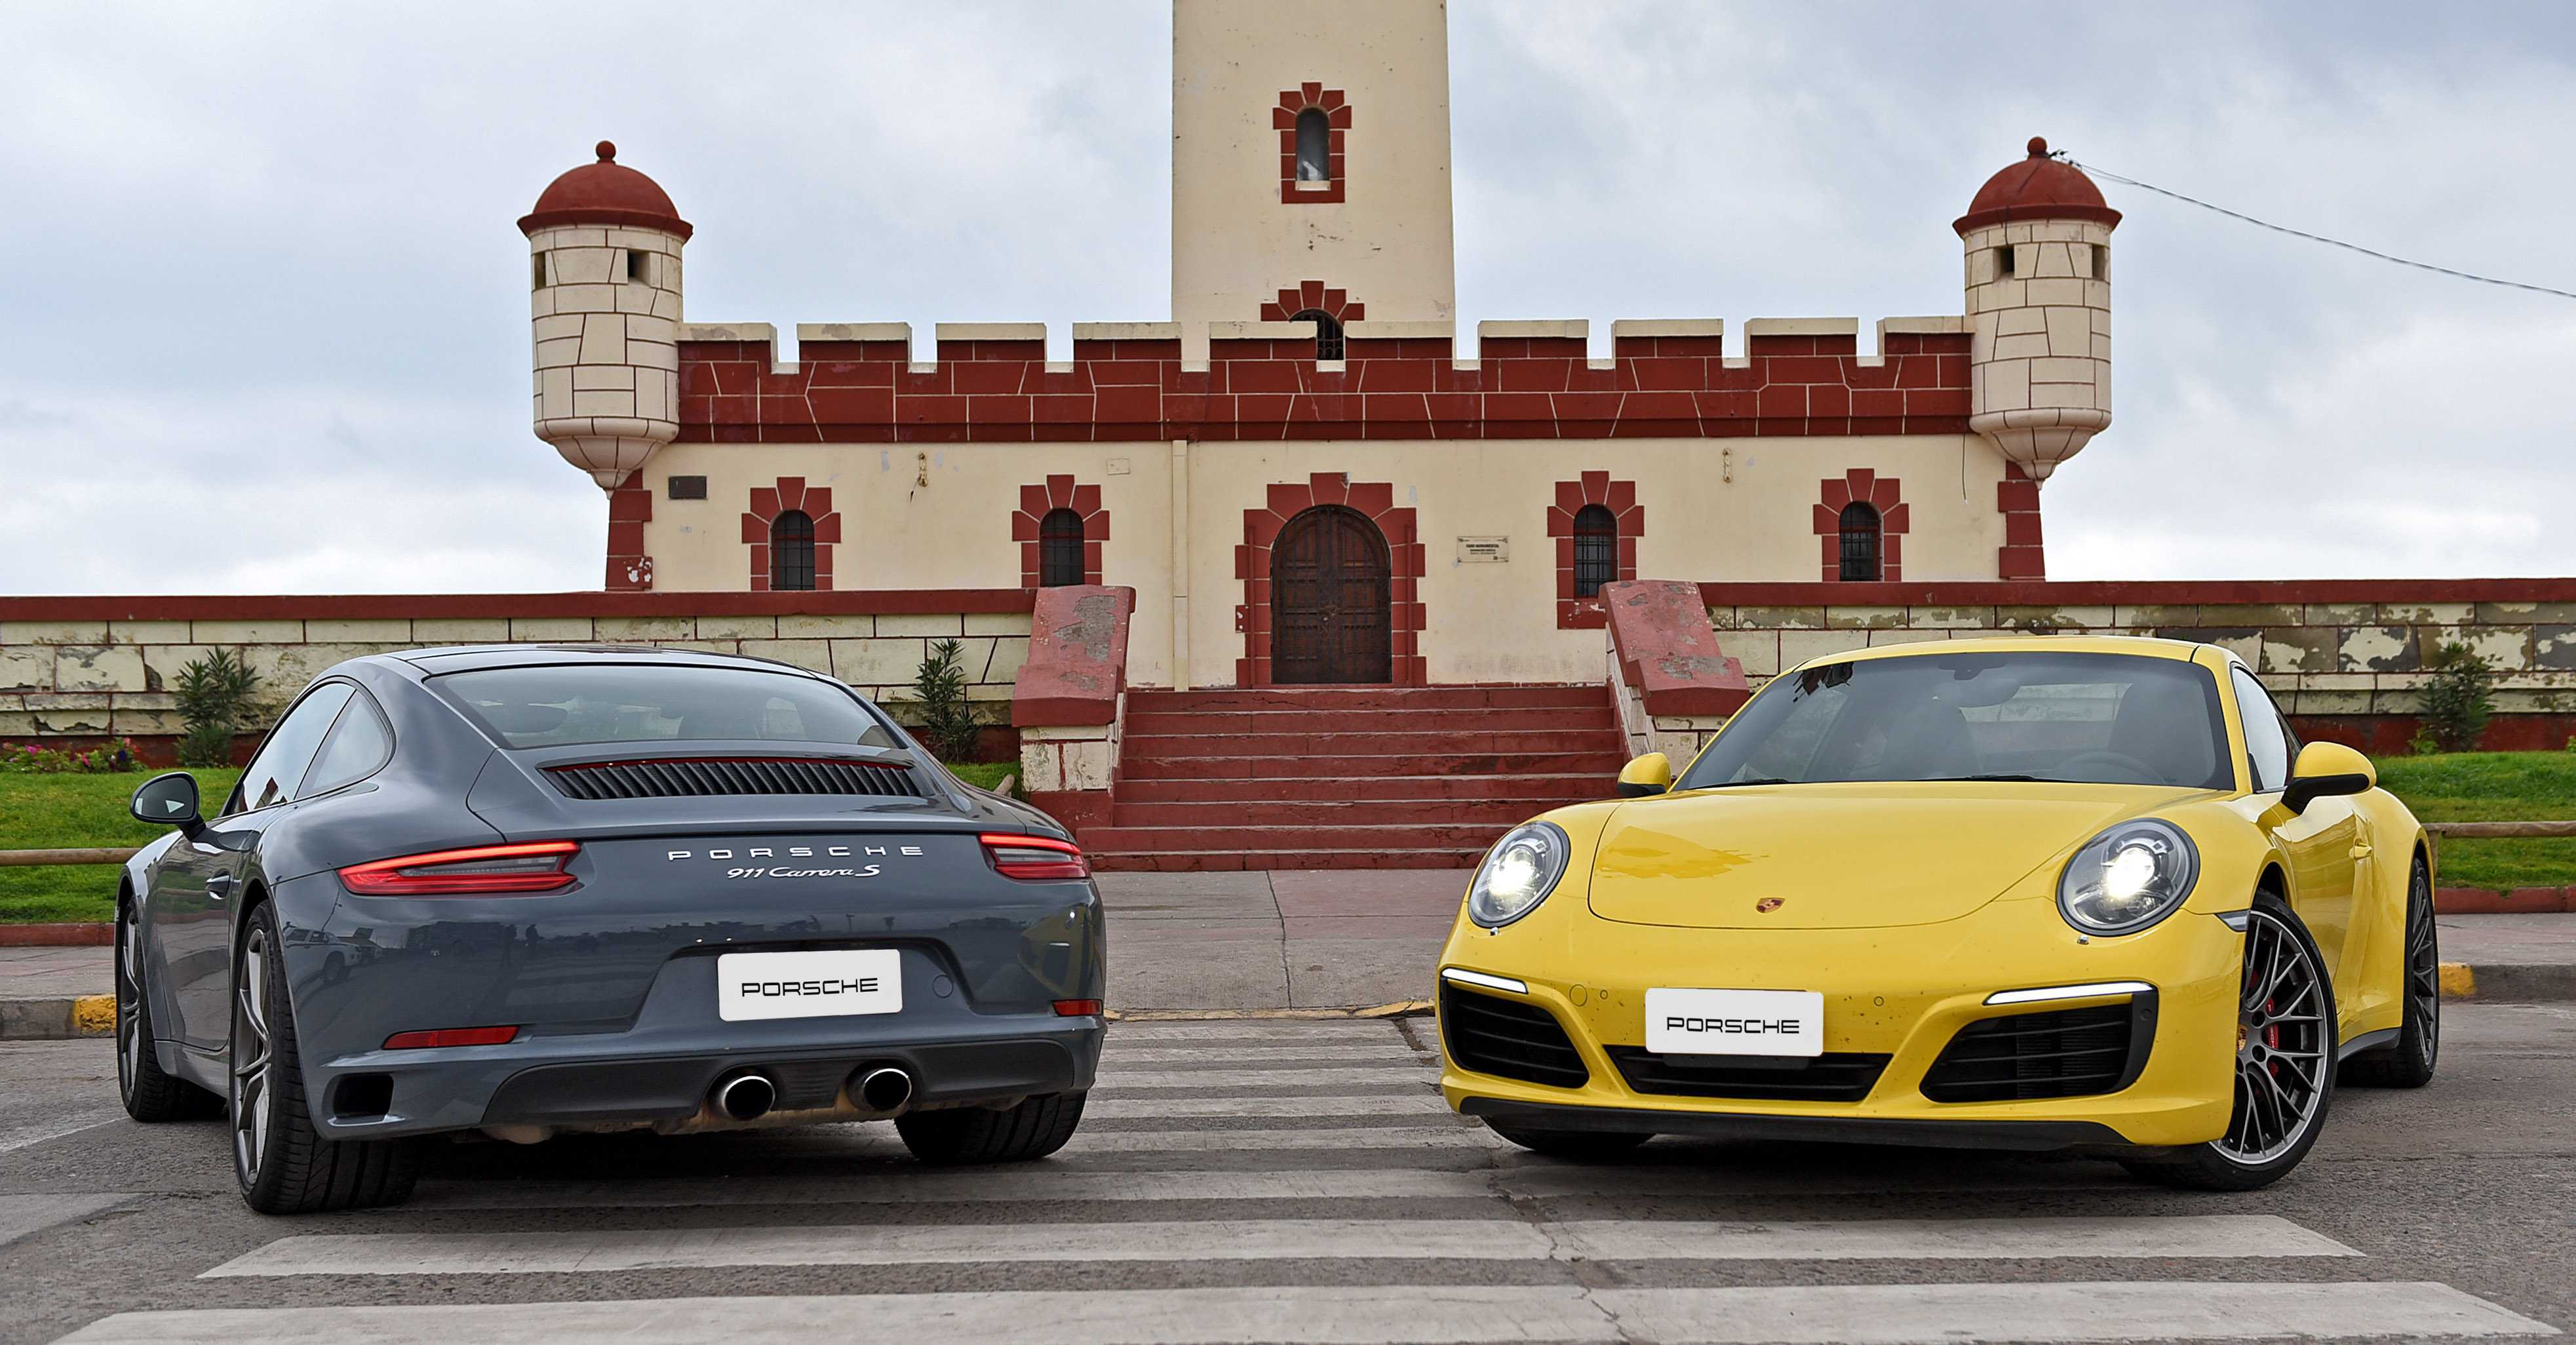 Porsche Carrera S 095